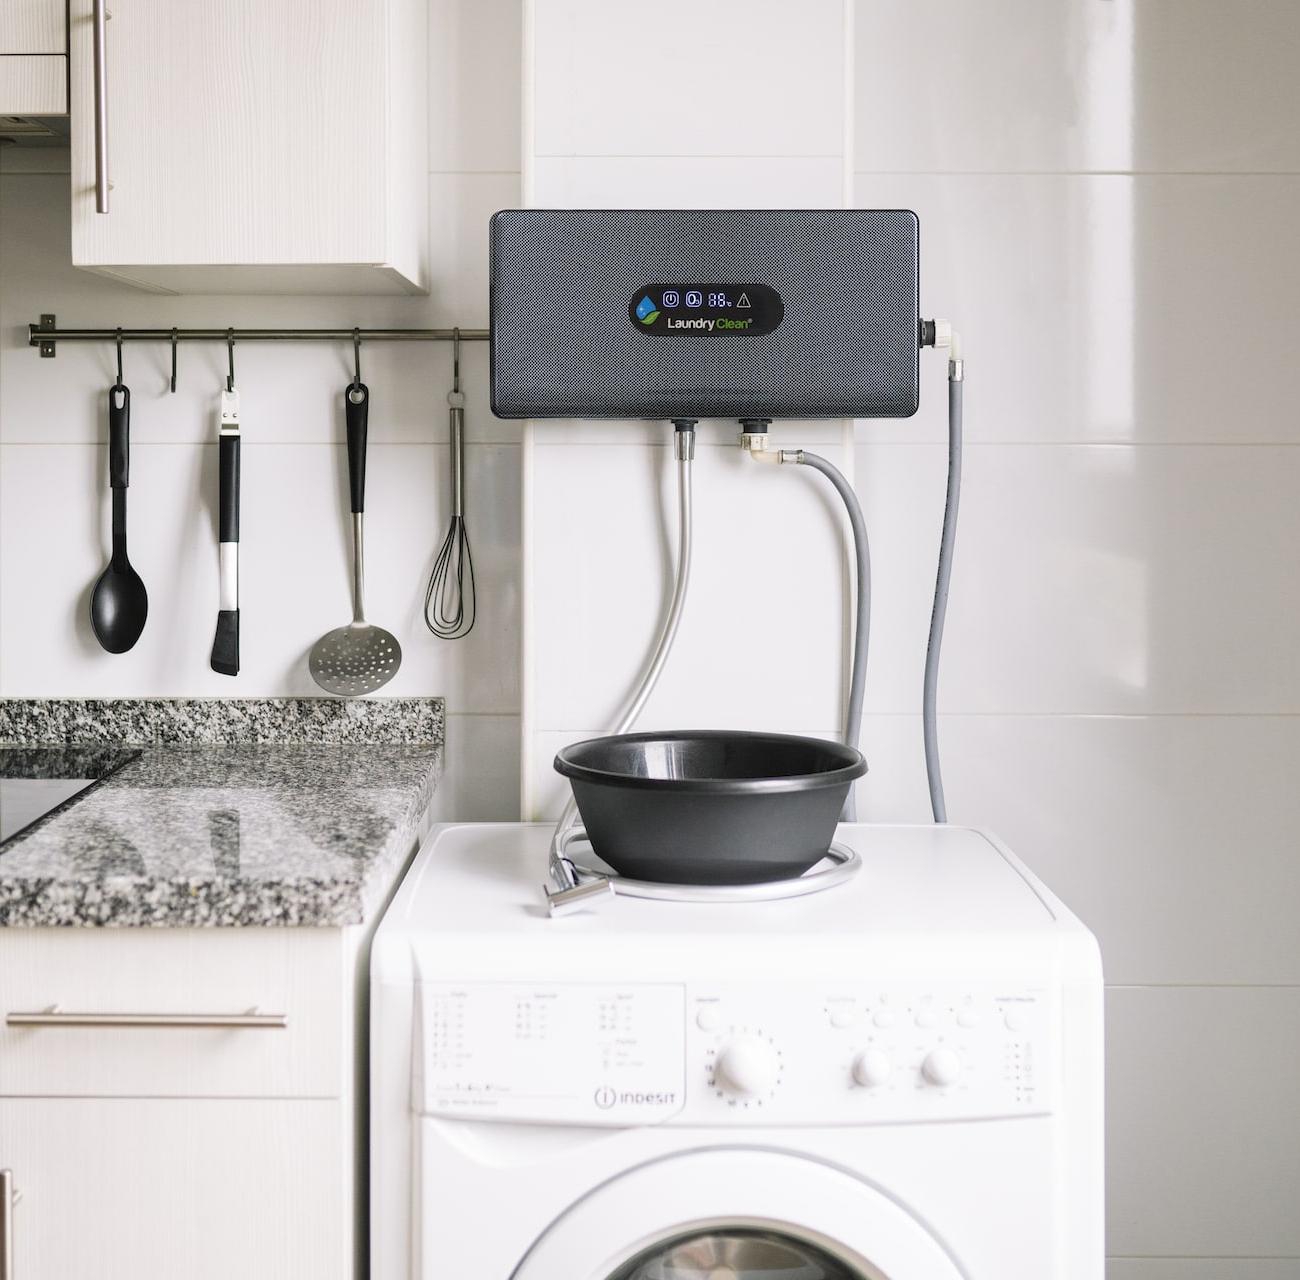 laundry-clean-cocina-1300x1280